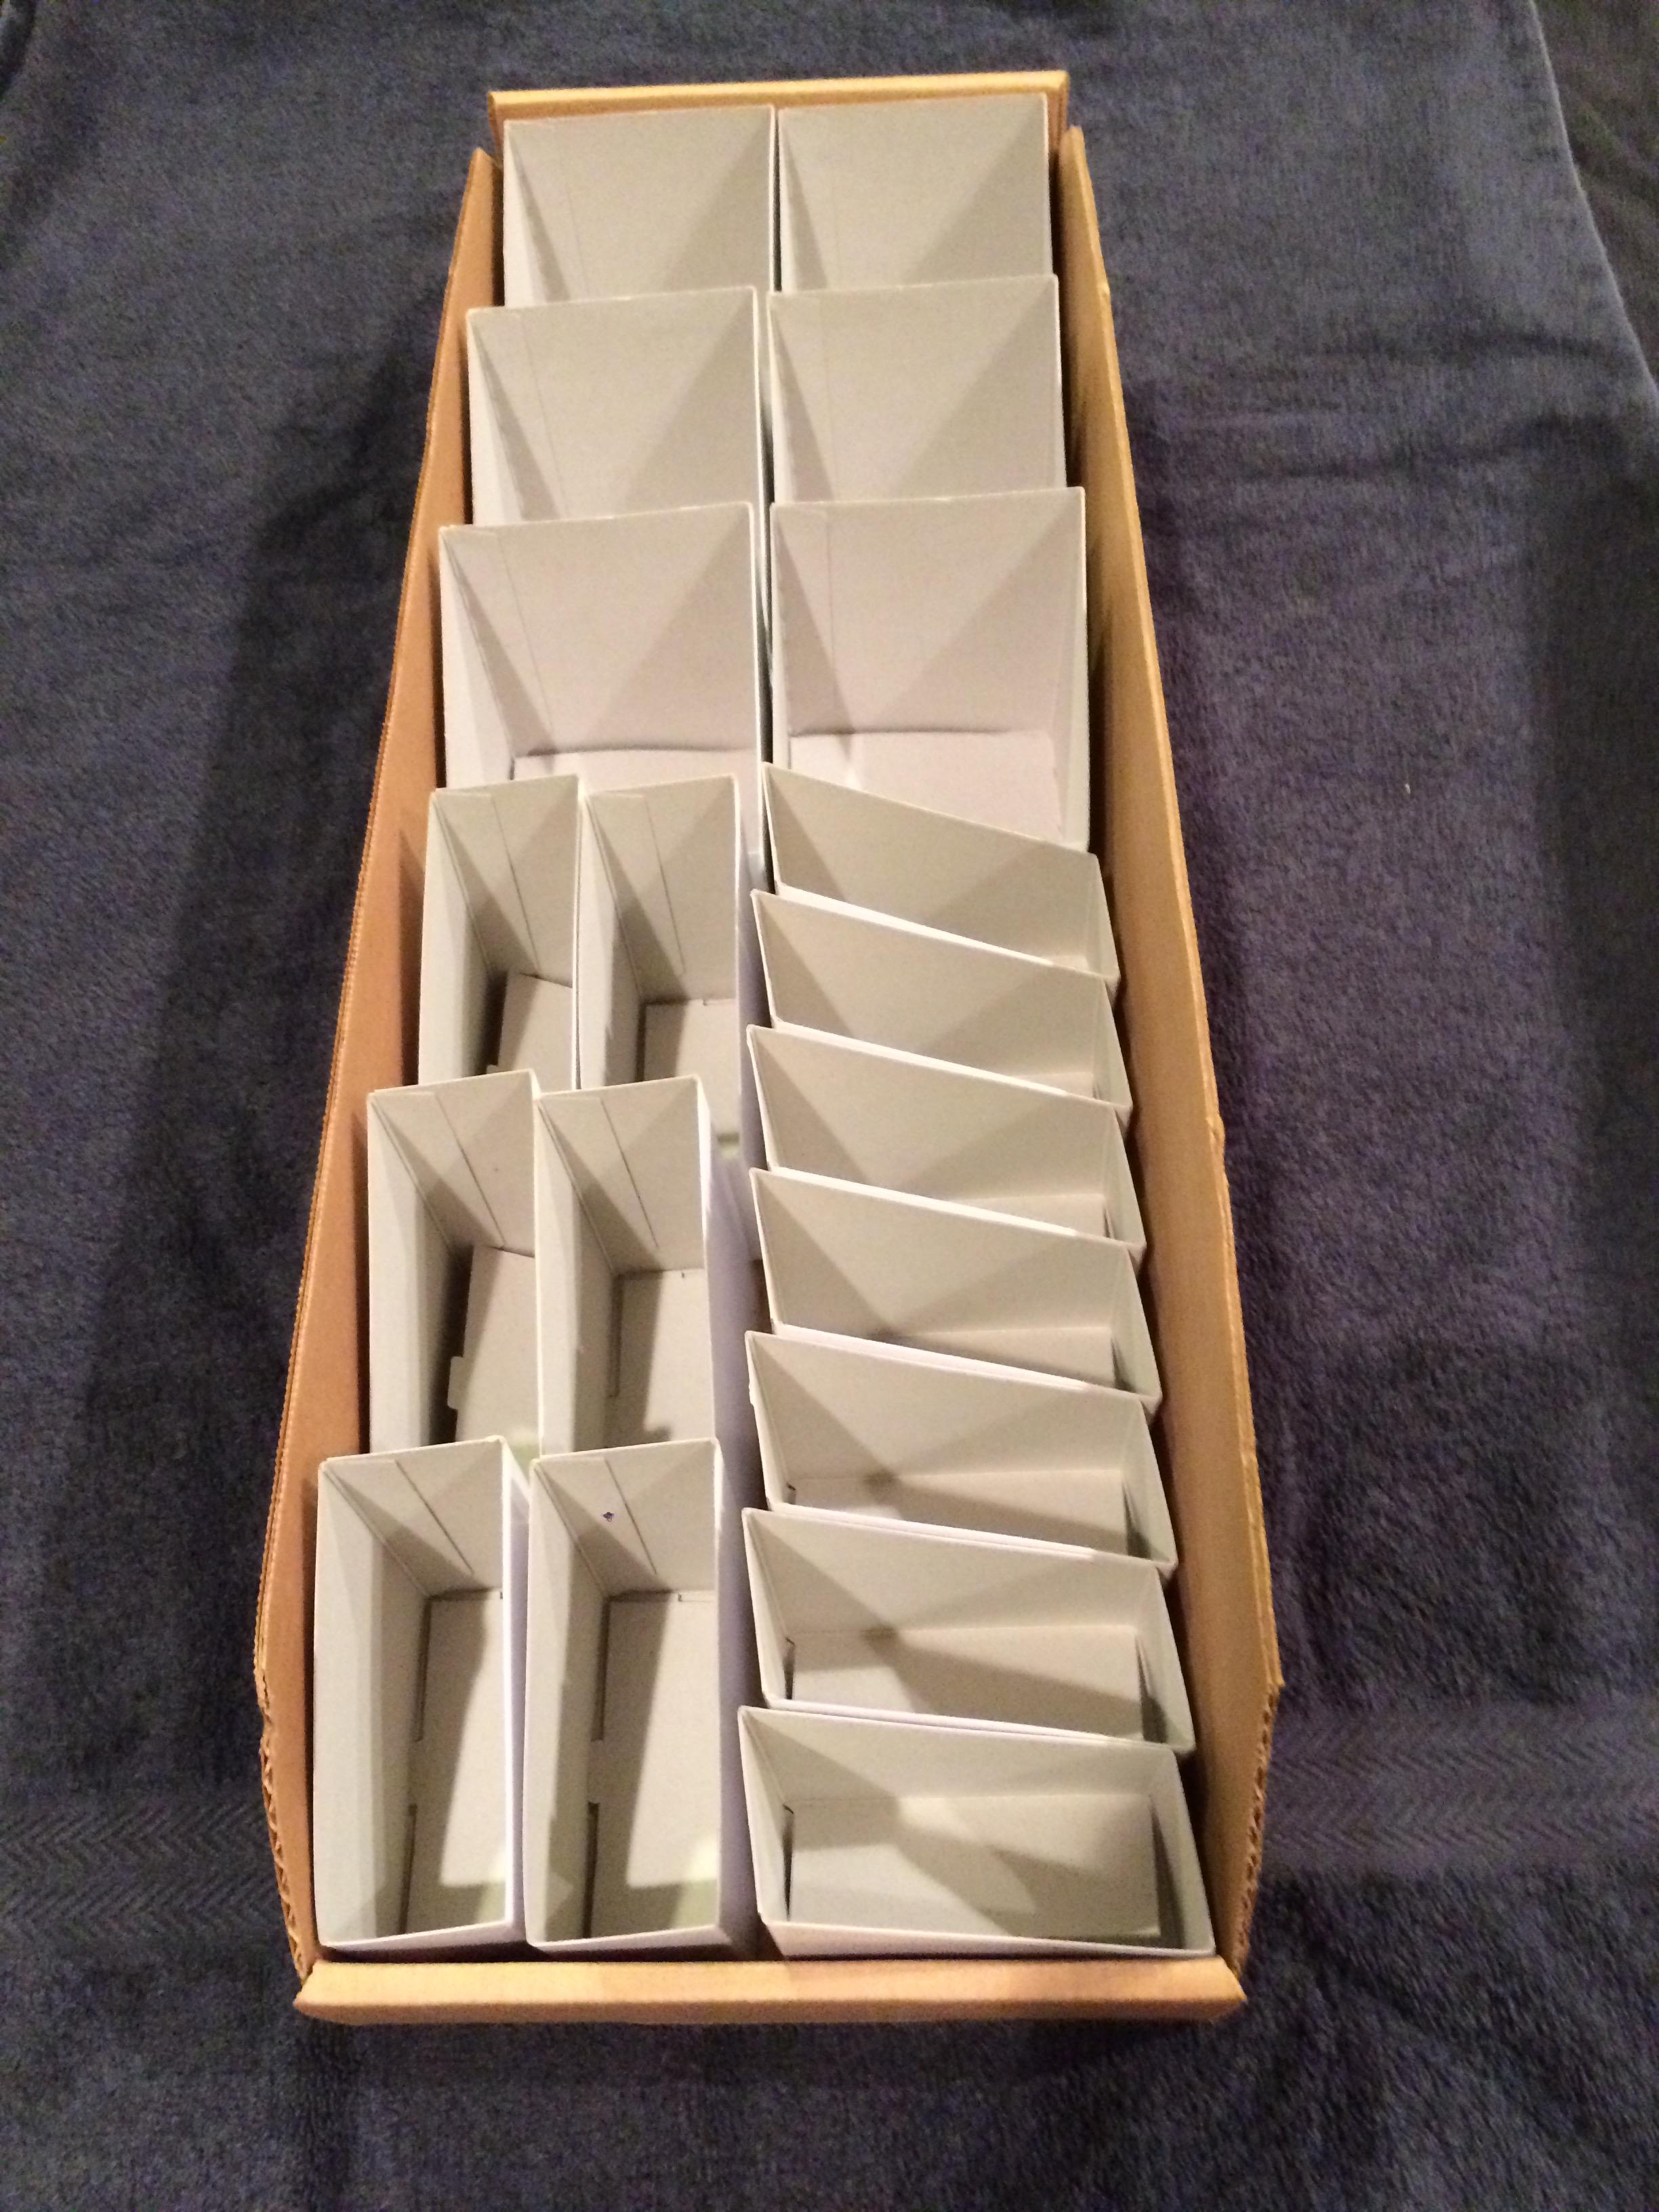 Flexible shelf organization bins